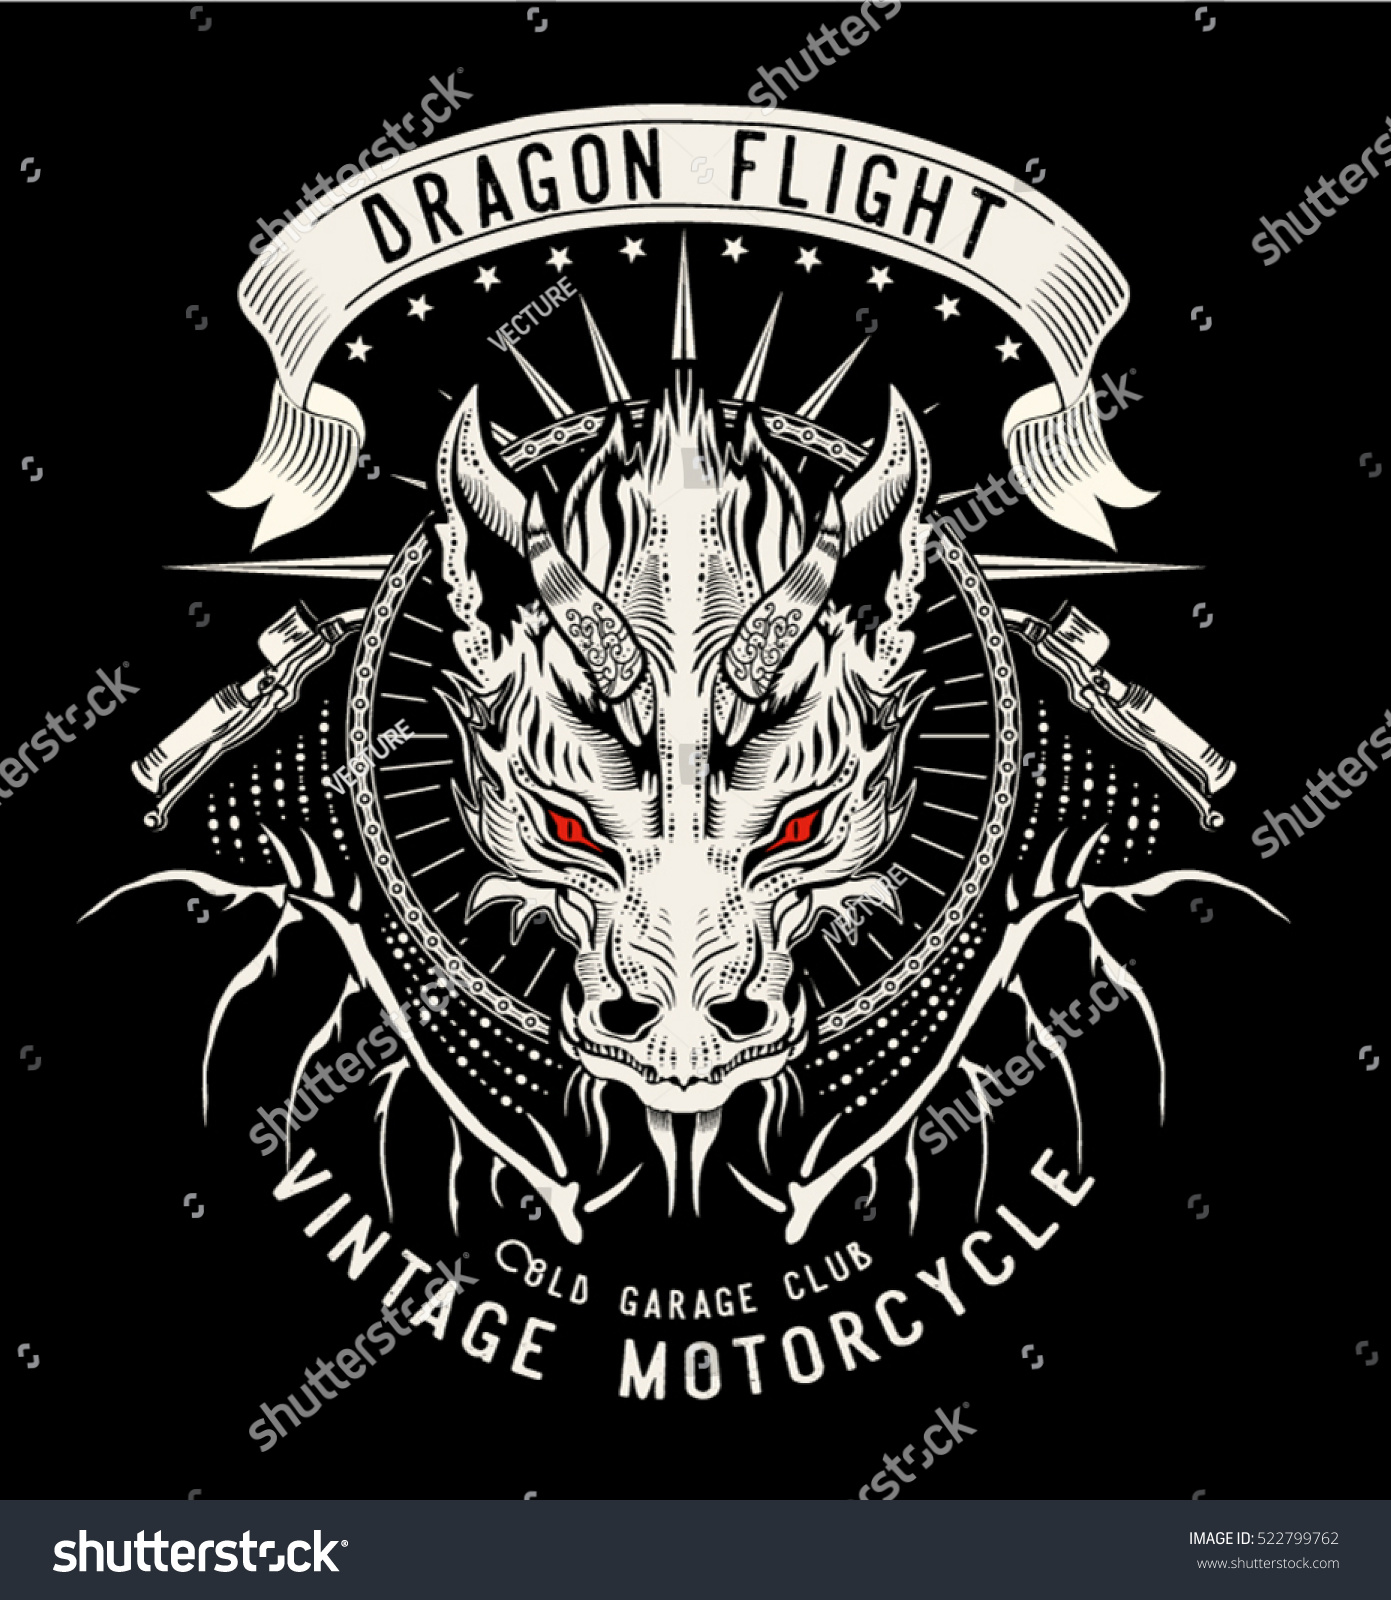 Dragon flightvintage motorcycle garage clubvector for Tattoo art club